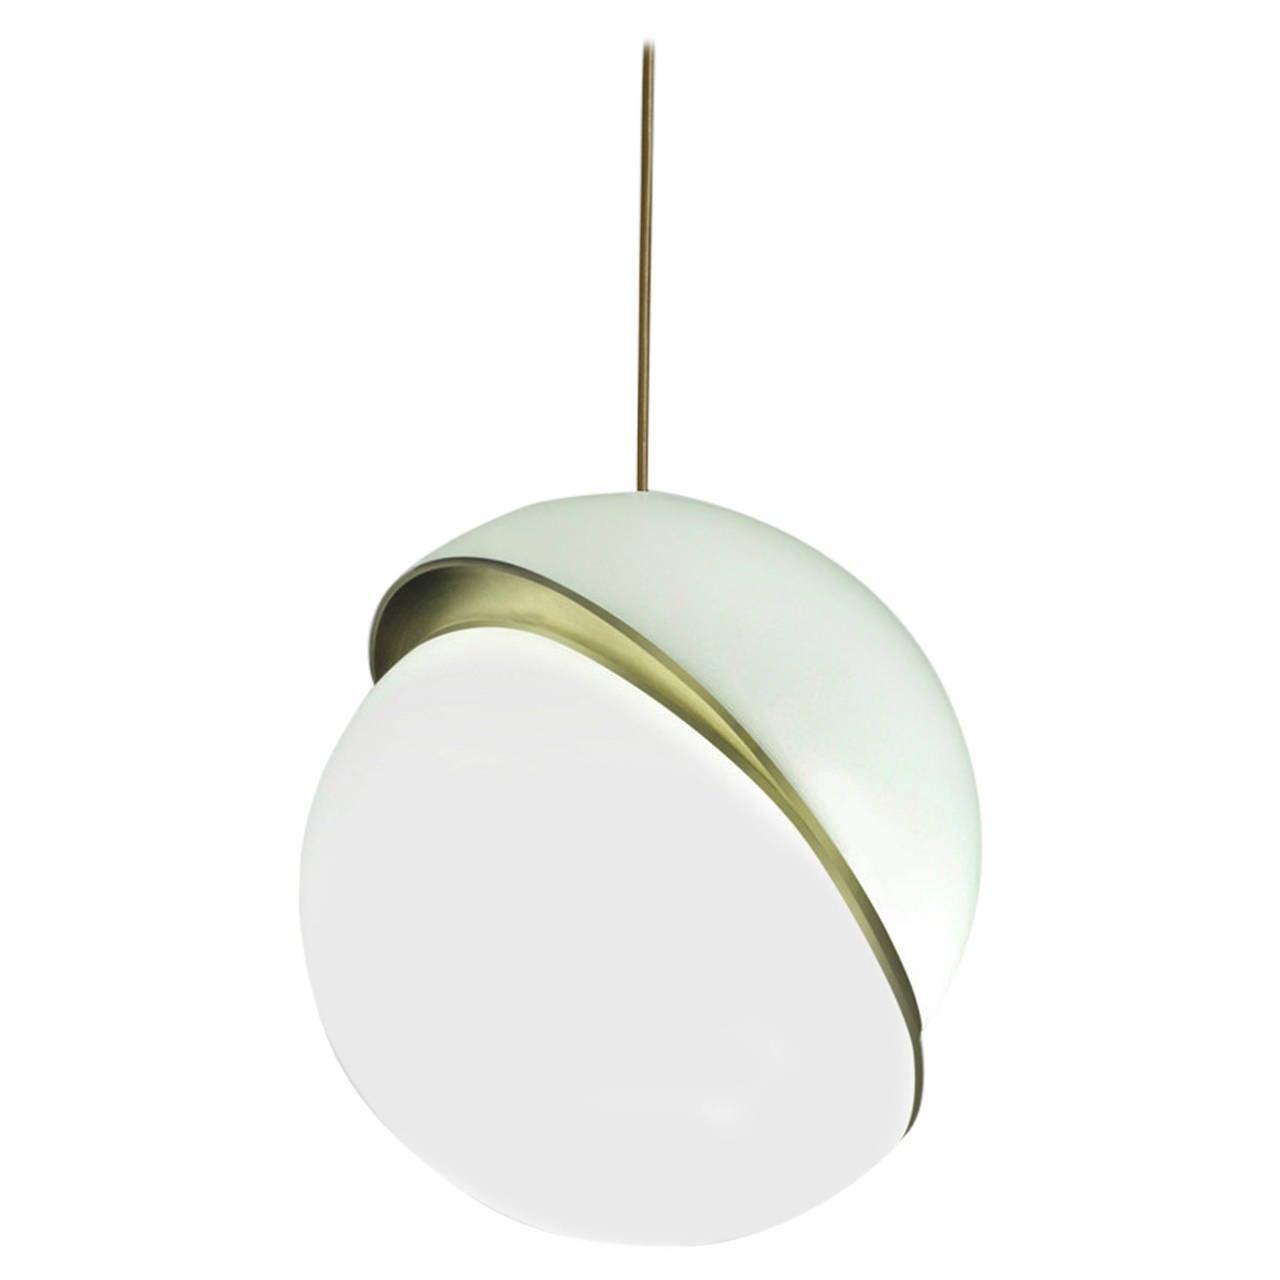 Crescent Light By Lee Broom For Sale At 1stdibs